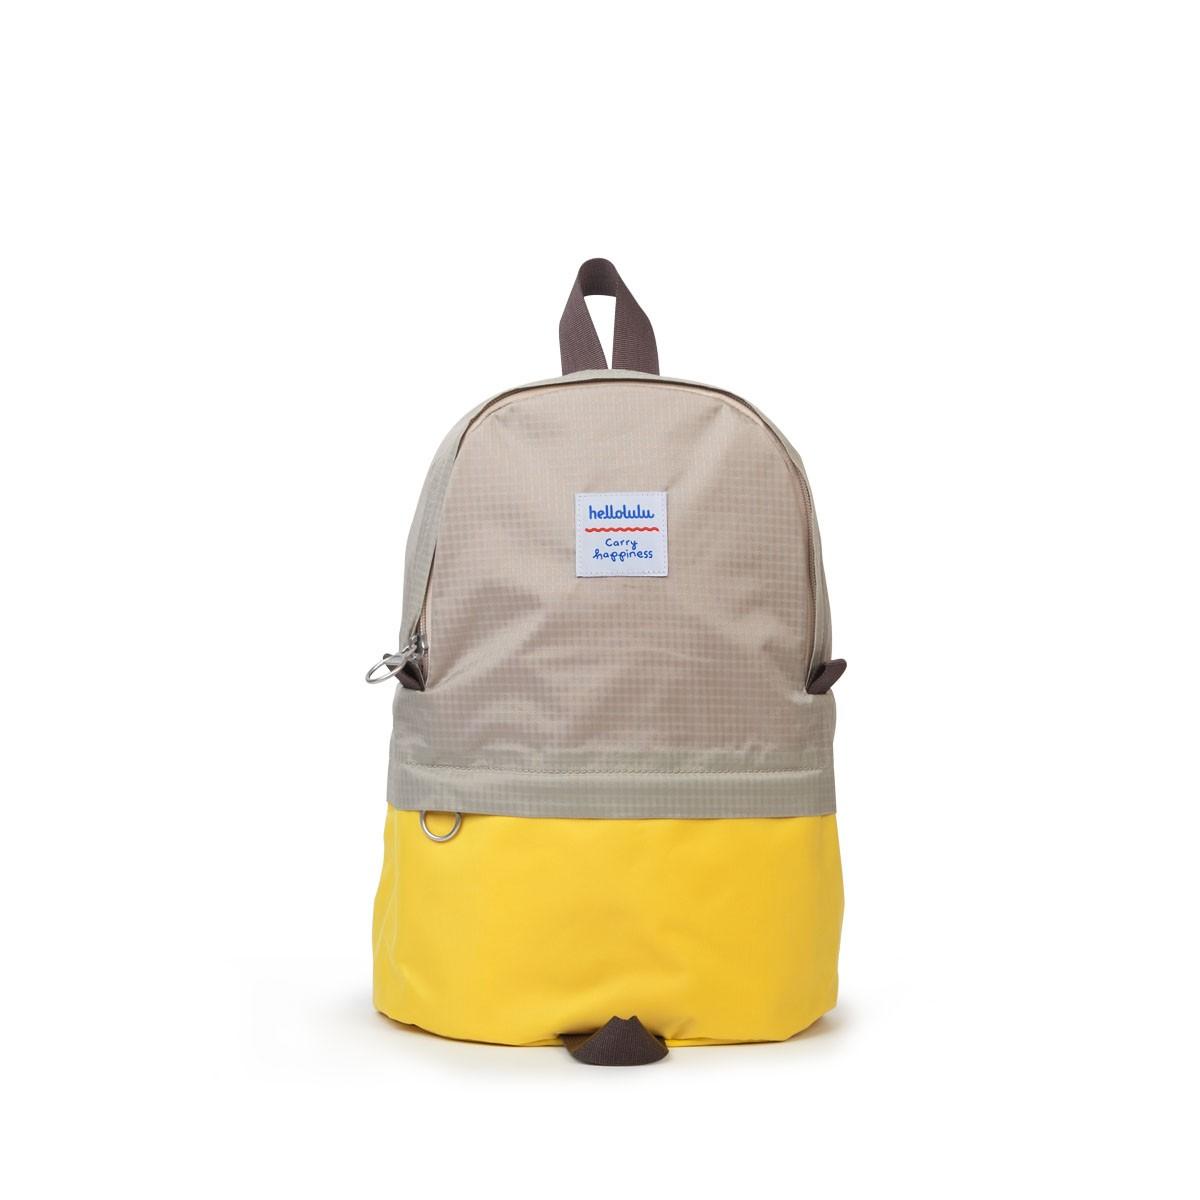 Hellolulu กระเป๋าเด็ก รุ่น PILI - GRAY/YELLOW